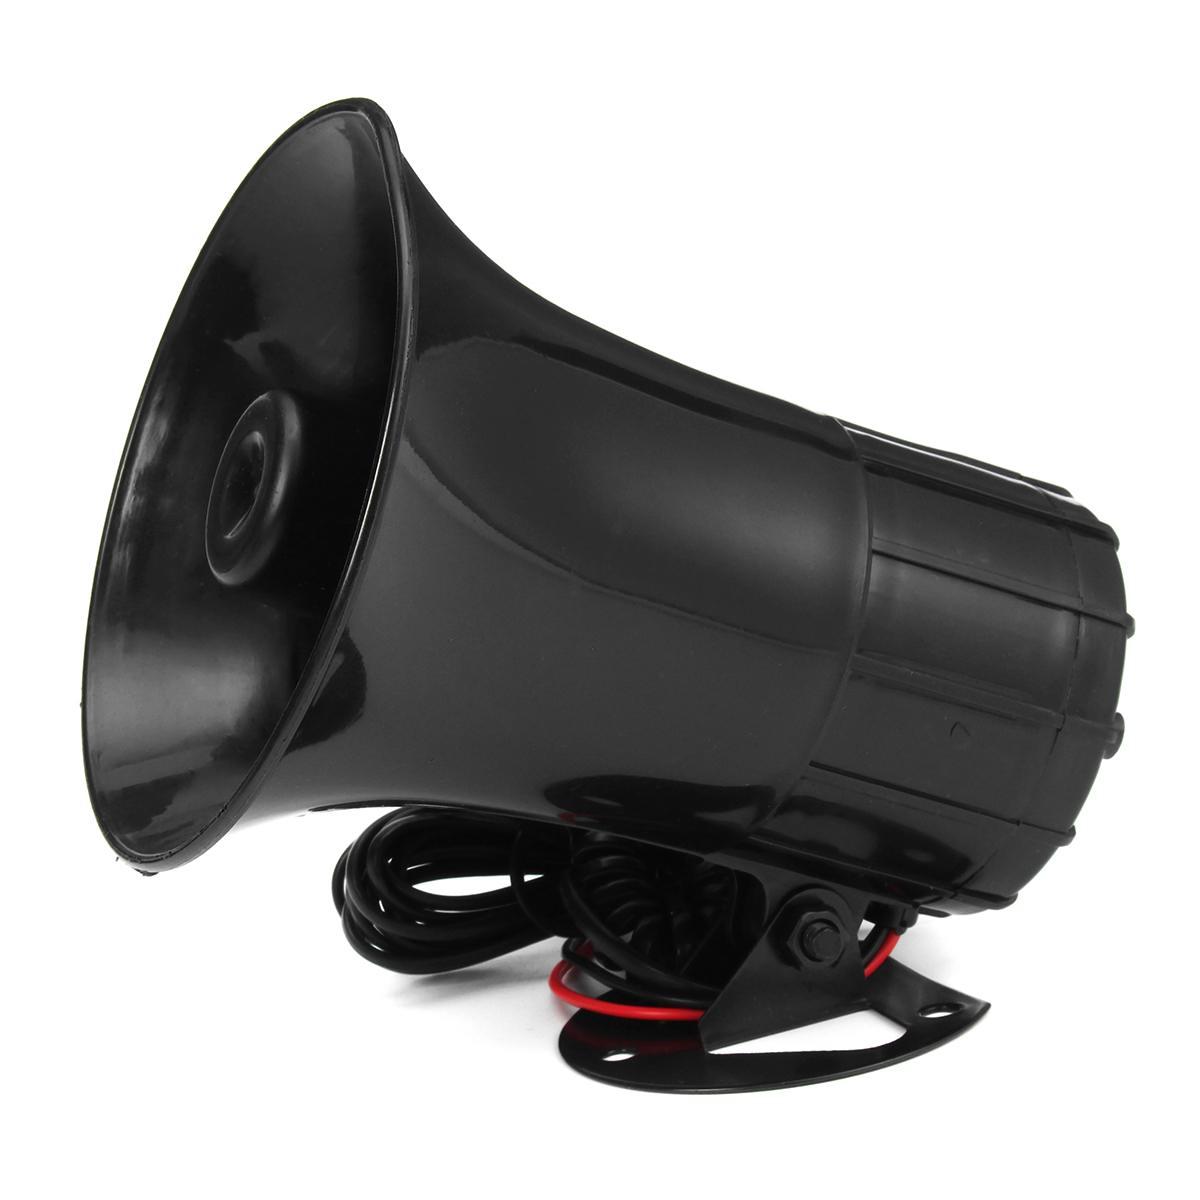 12V 100W 300DB Loud Car Truck 7 Sound Tone Warning Alarm Horn PA Speaker Mic Kit